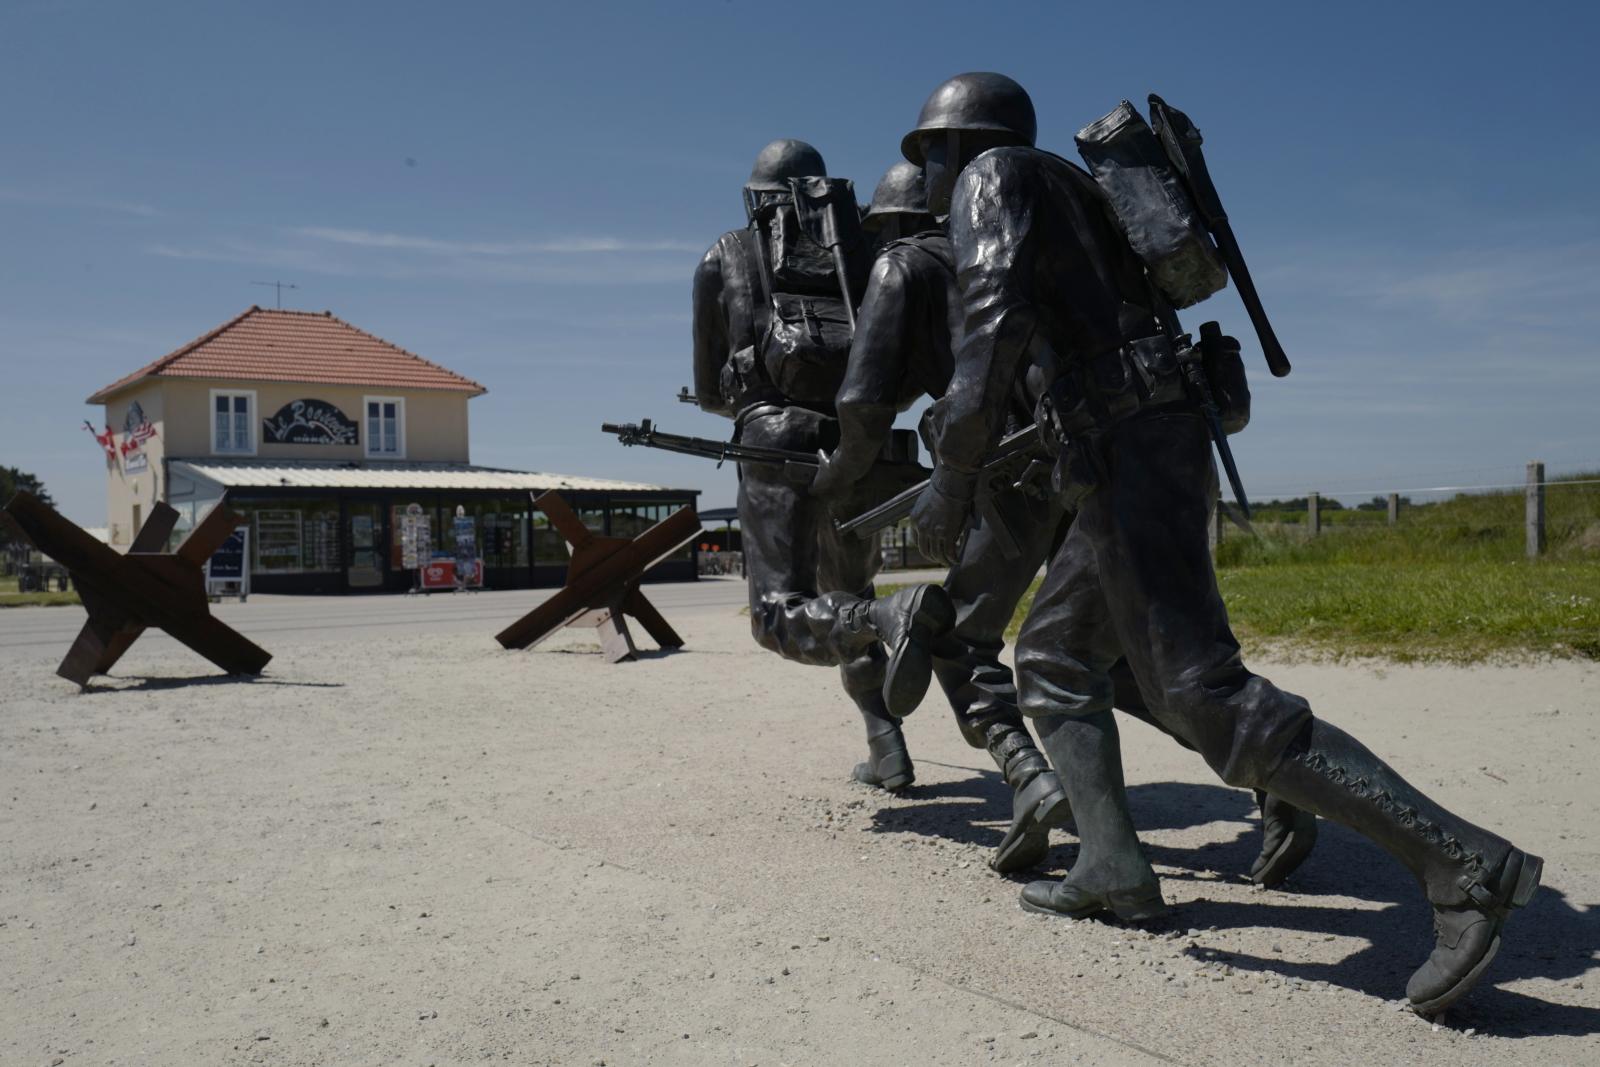 Francja: Rocznica D-Day EPA/THIBAULT VANDERMERSCH